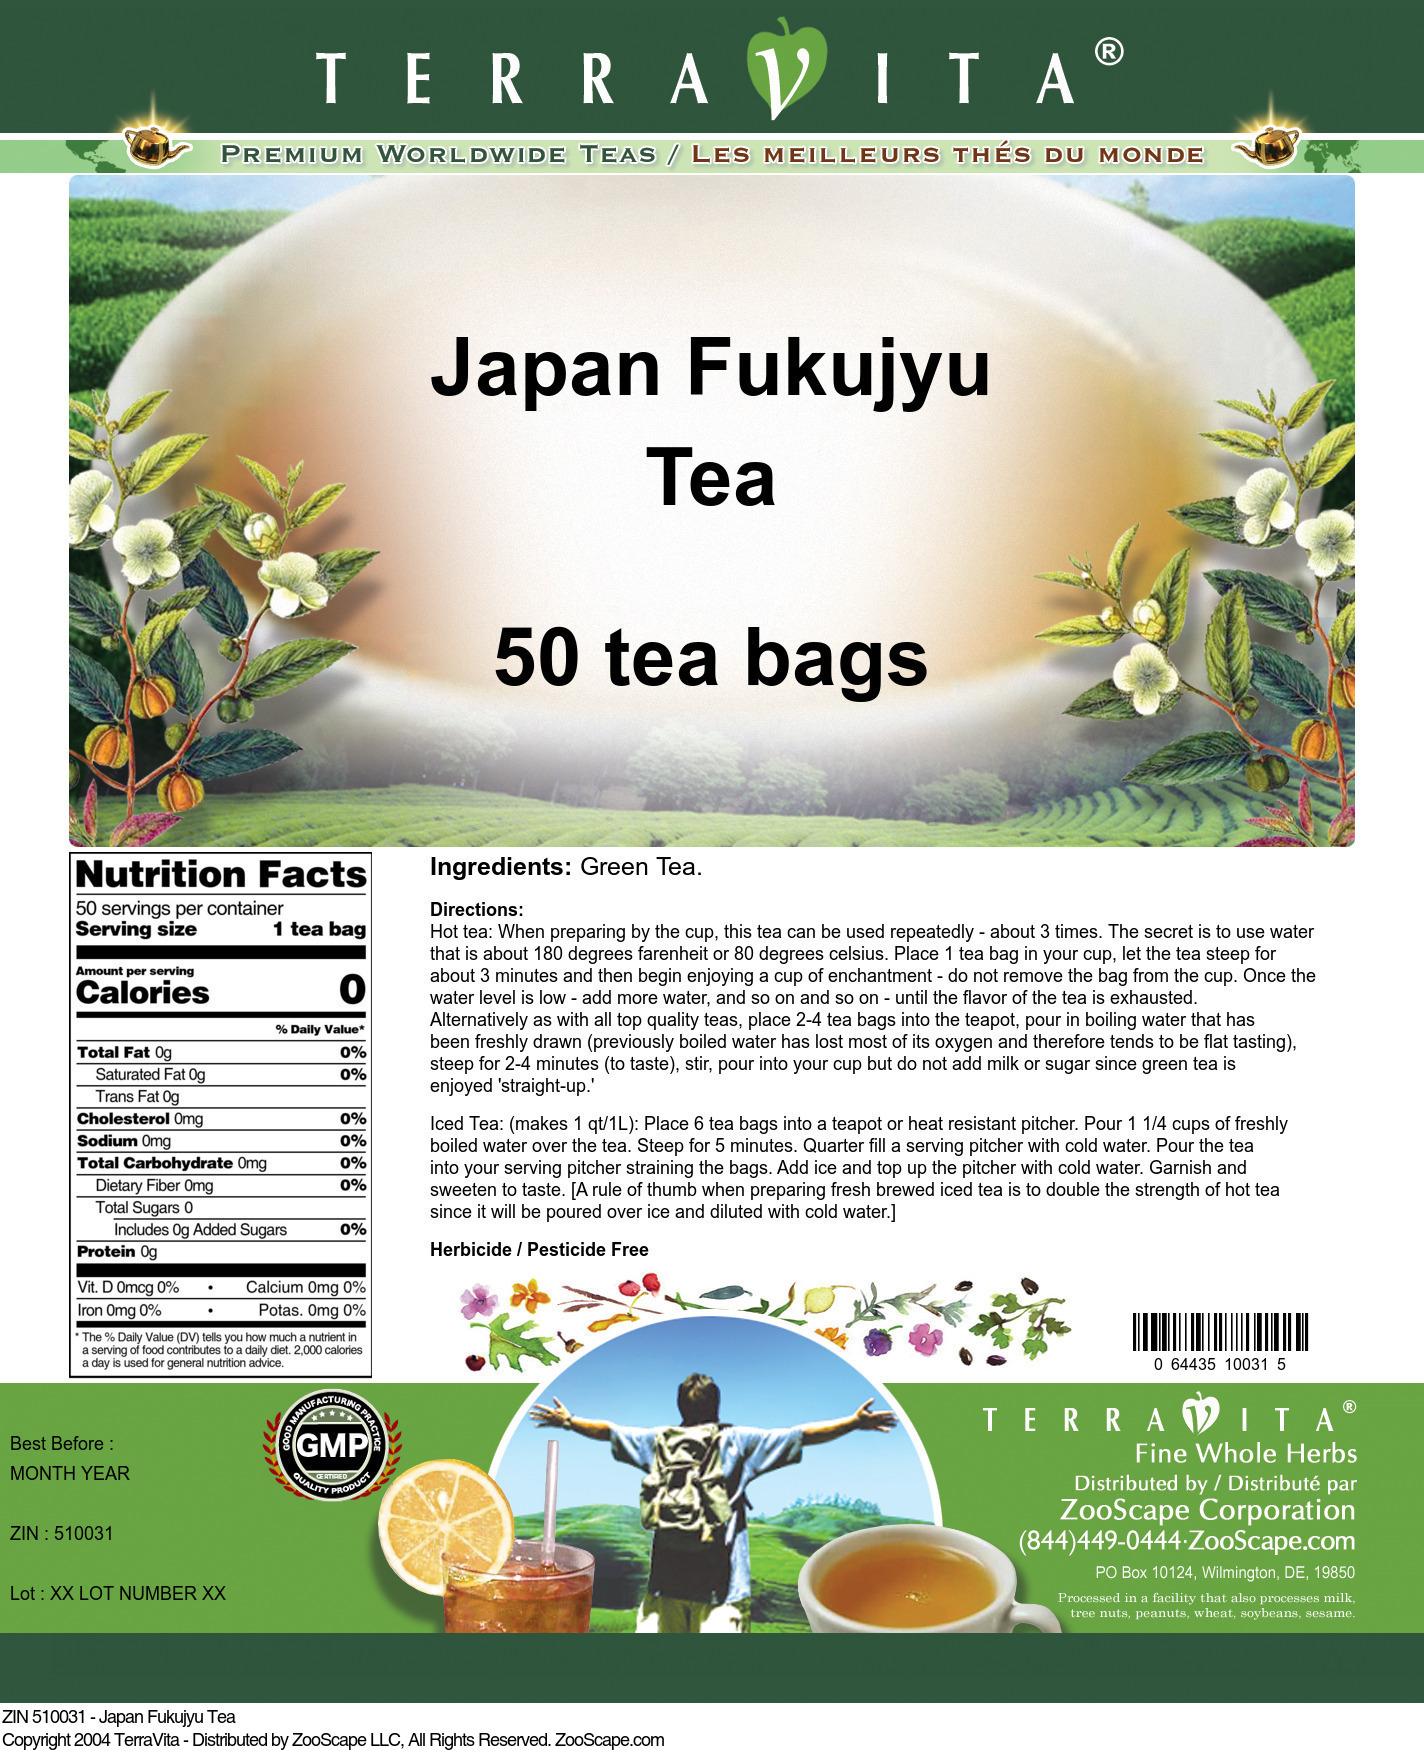 Japan Fukujyu Tea